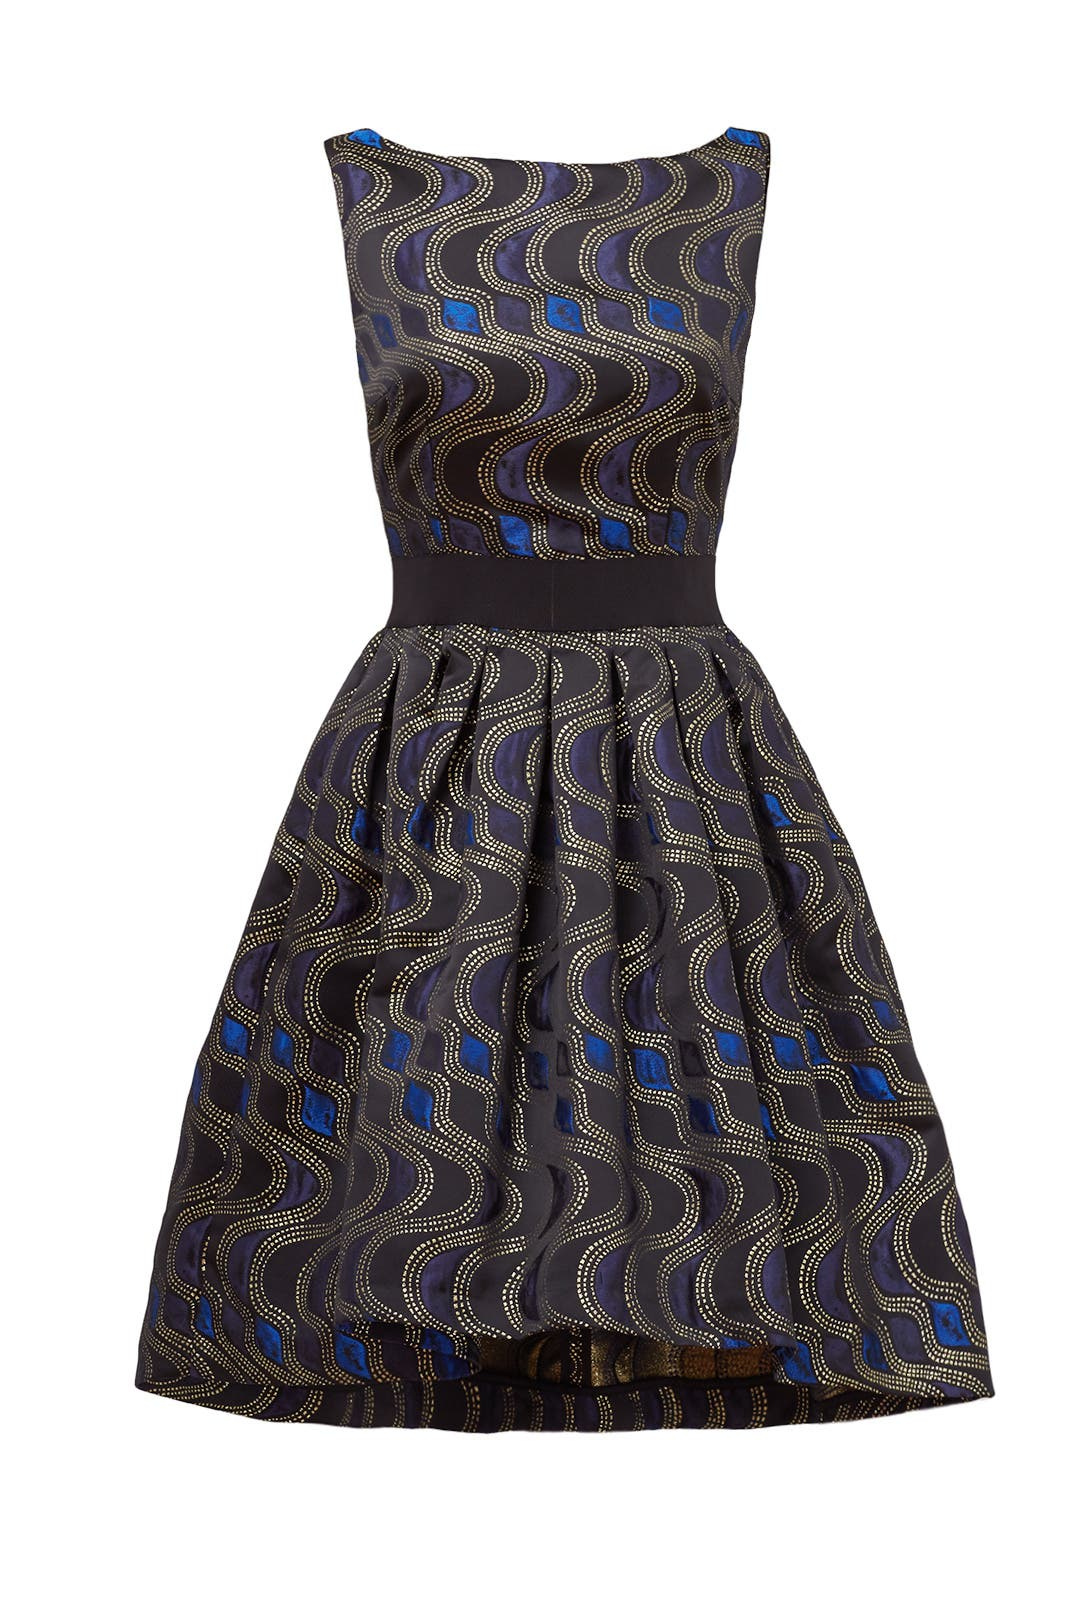 DRESSES - Short dresses Christian Pellizzari TCuxB9